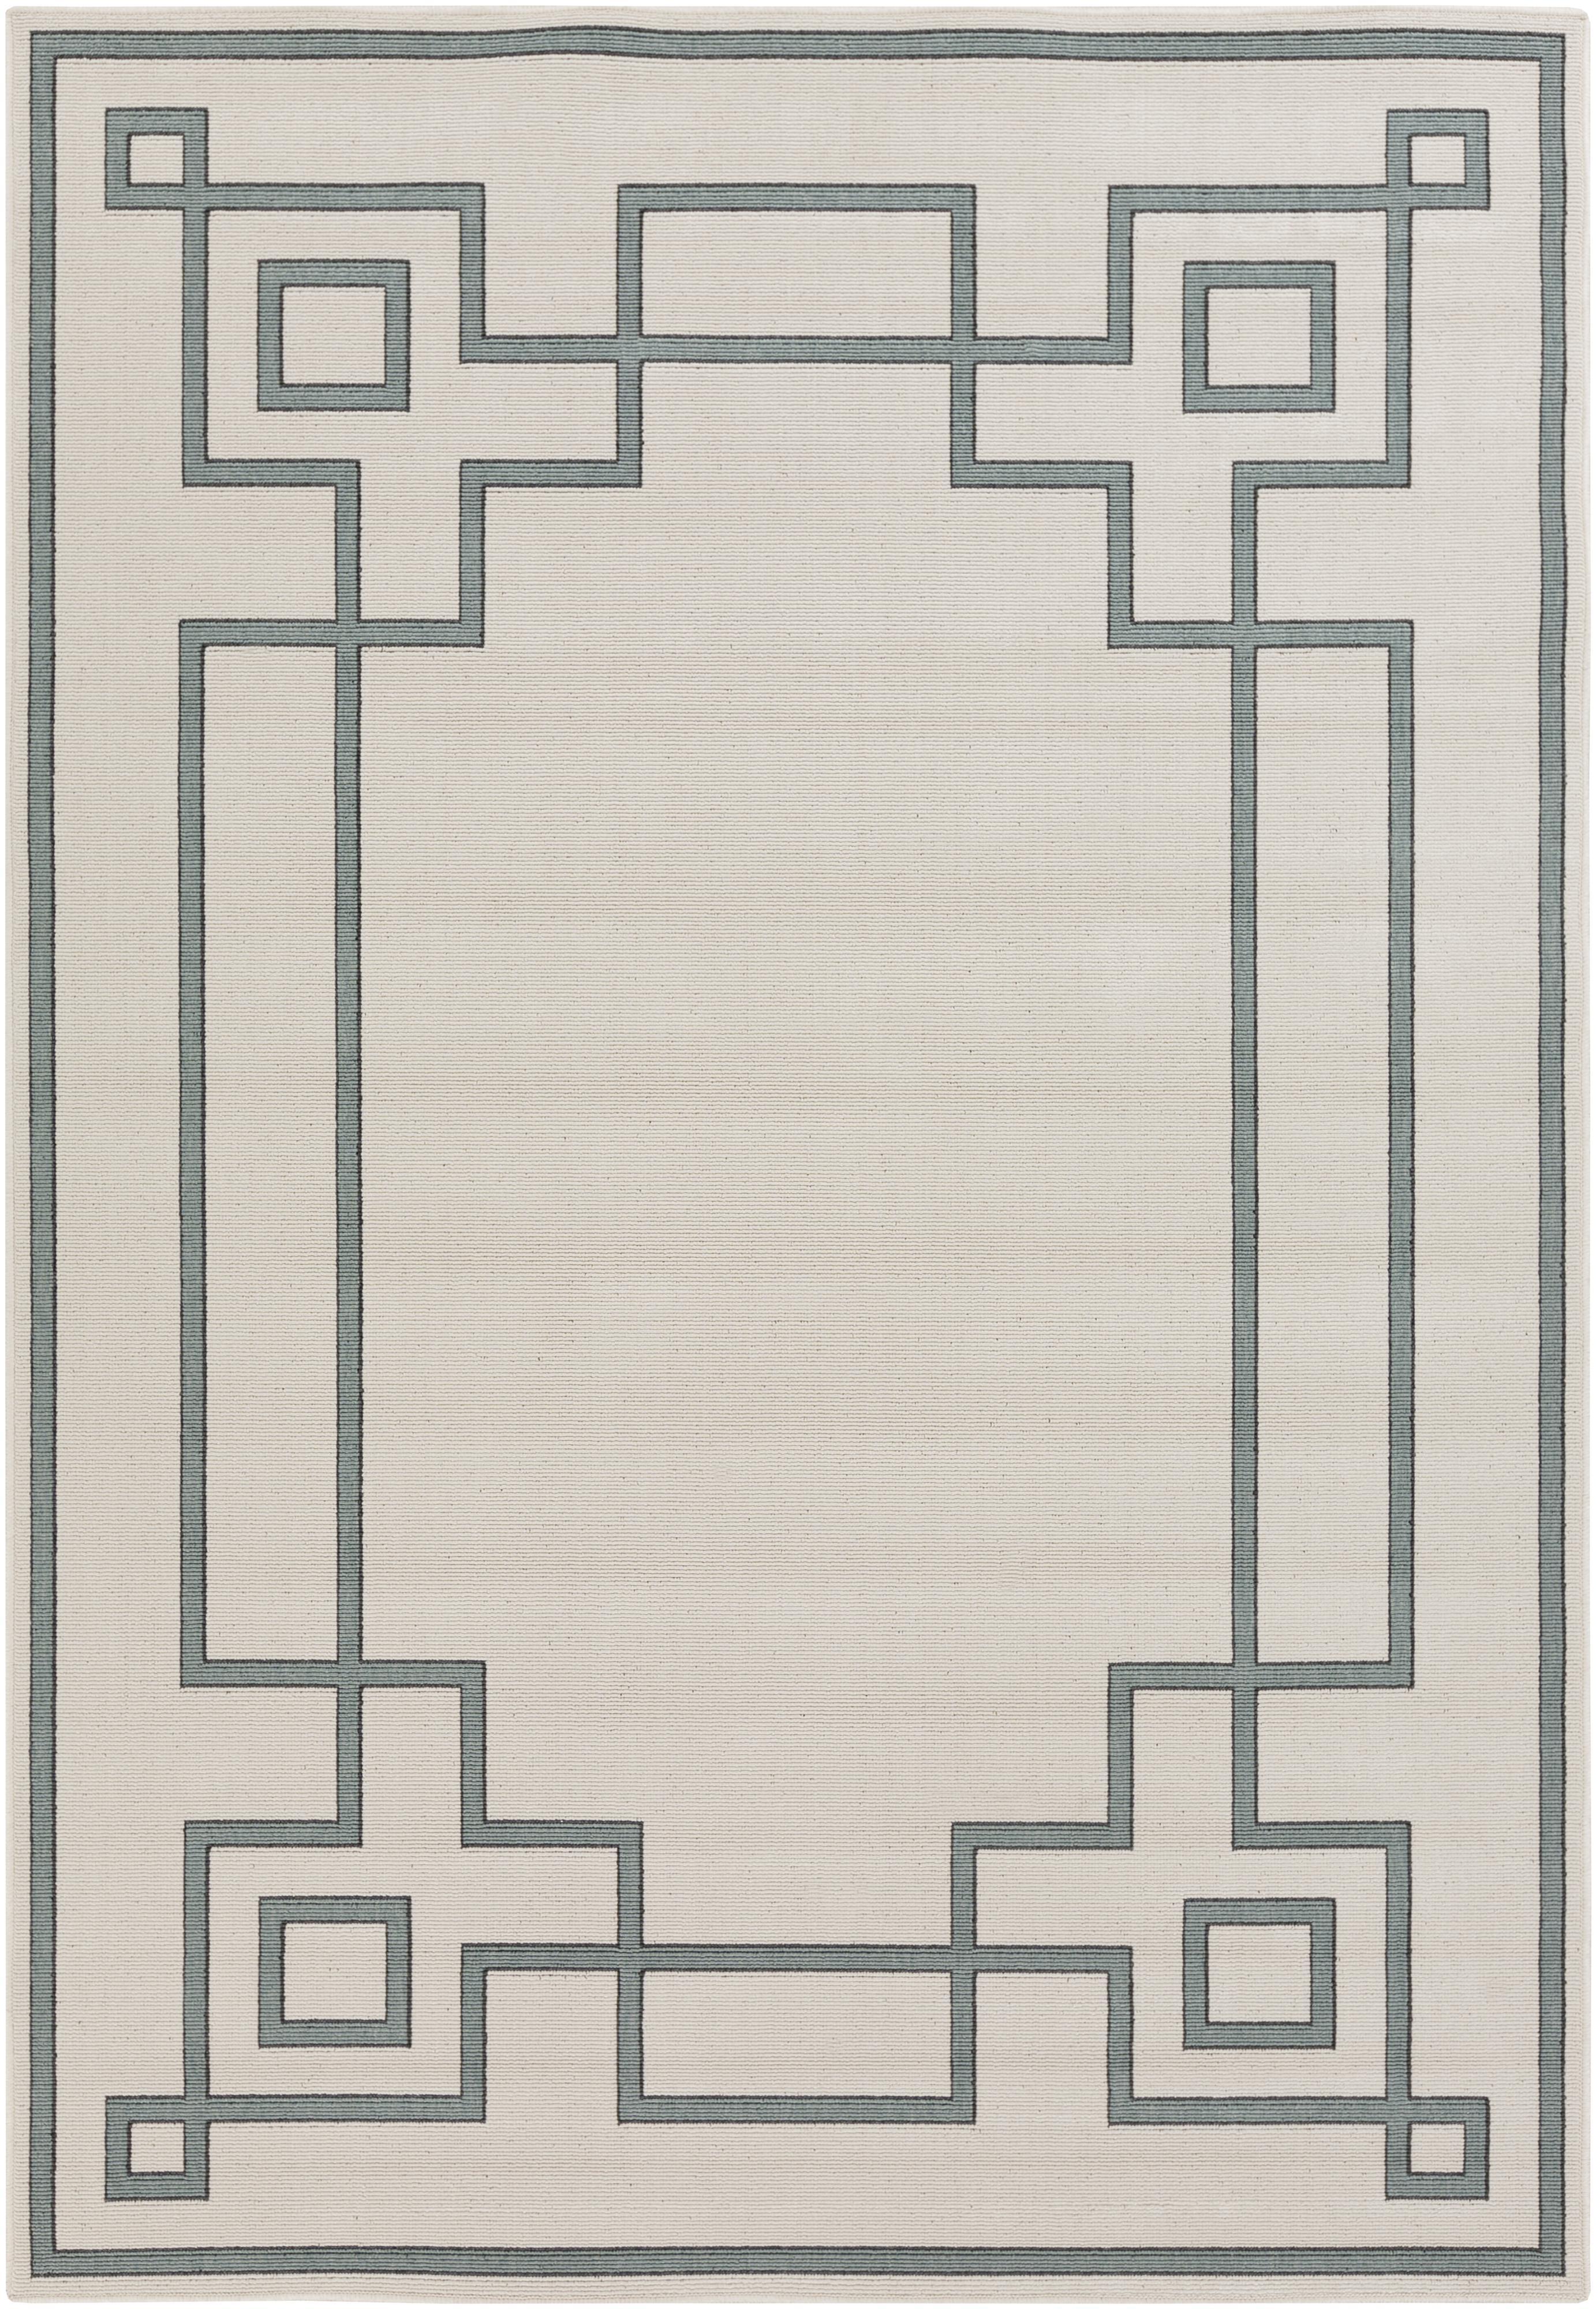 Alfresco 6' x 9' by Surya at Suburban Furniture